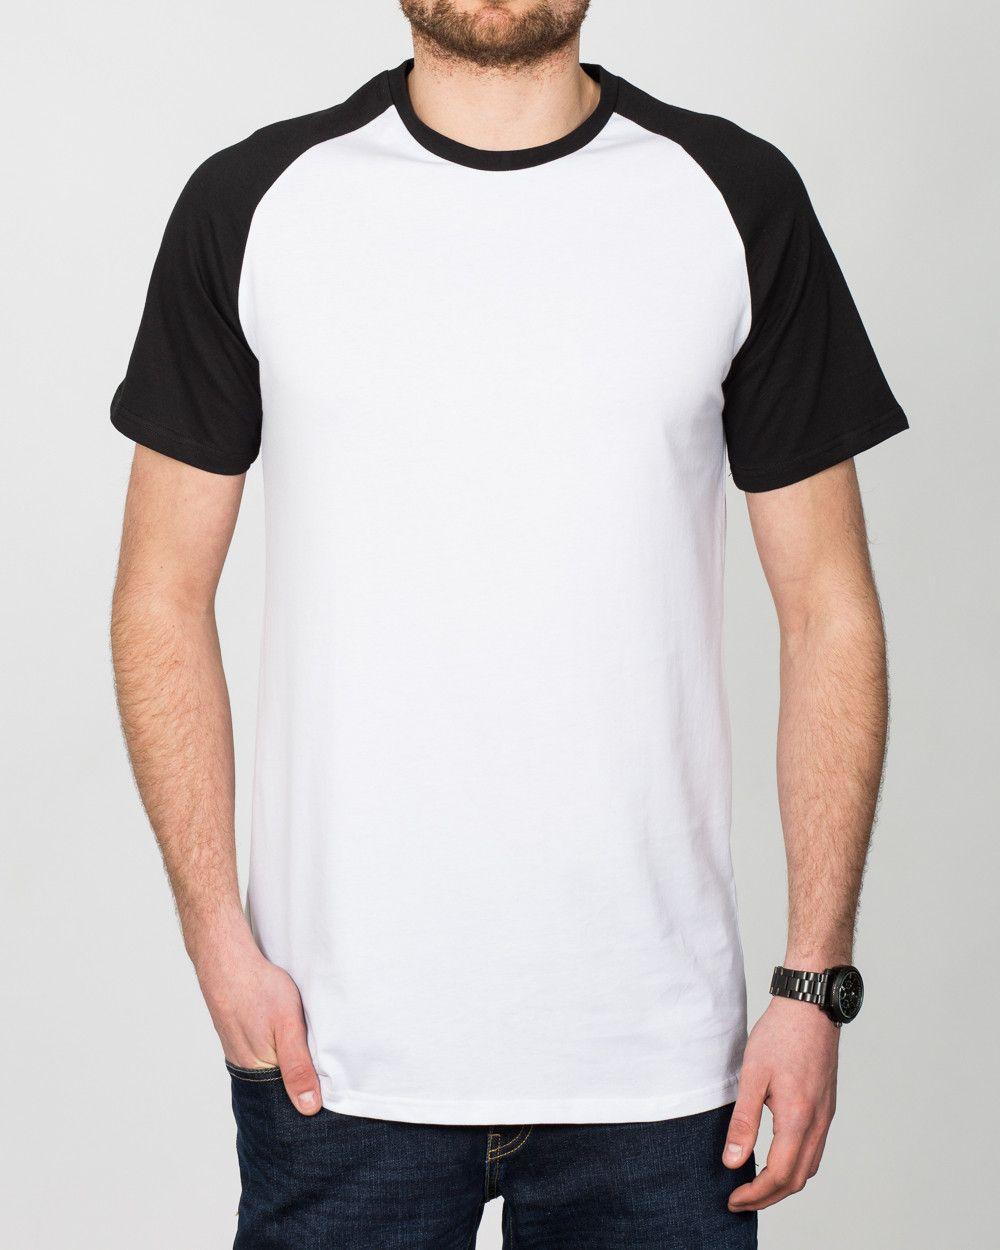 ba9bb6e644e 2t Tall Raglan Mens Extra Long T-Shirt (white black)